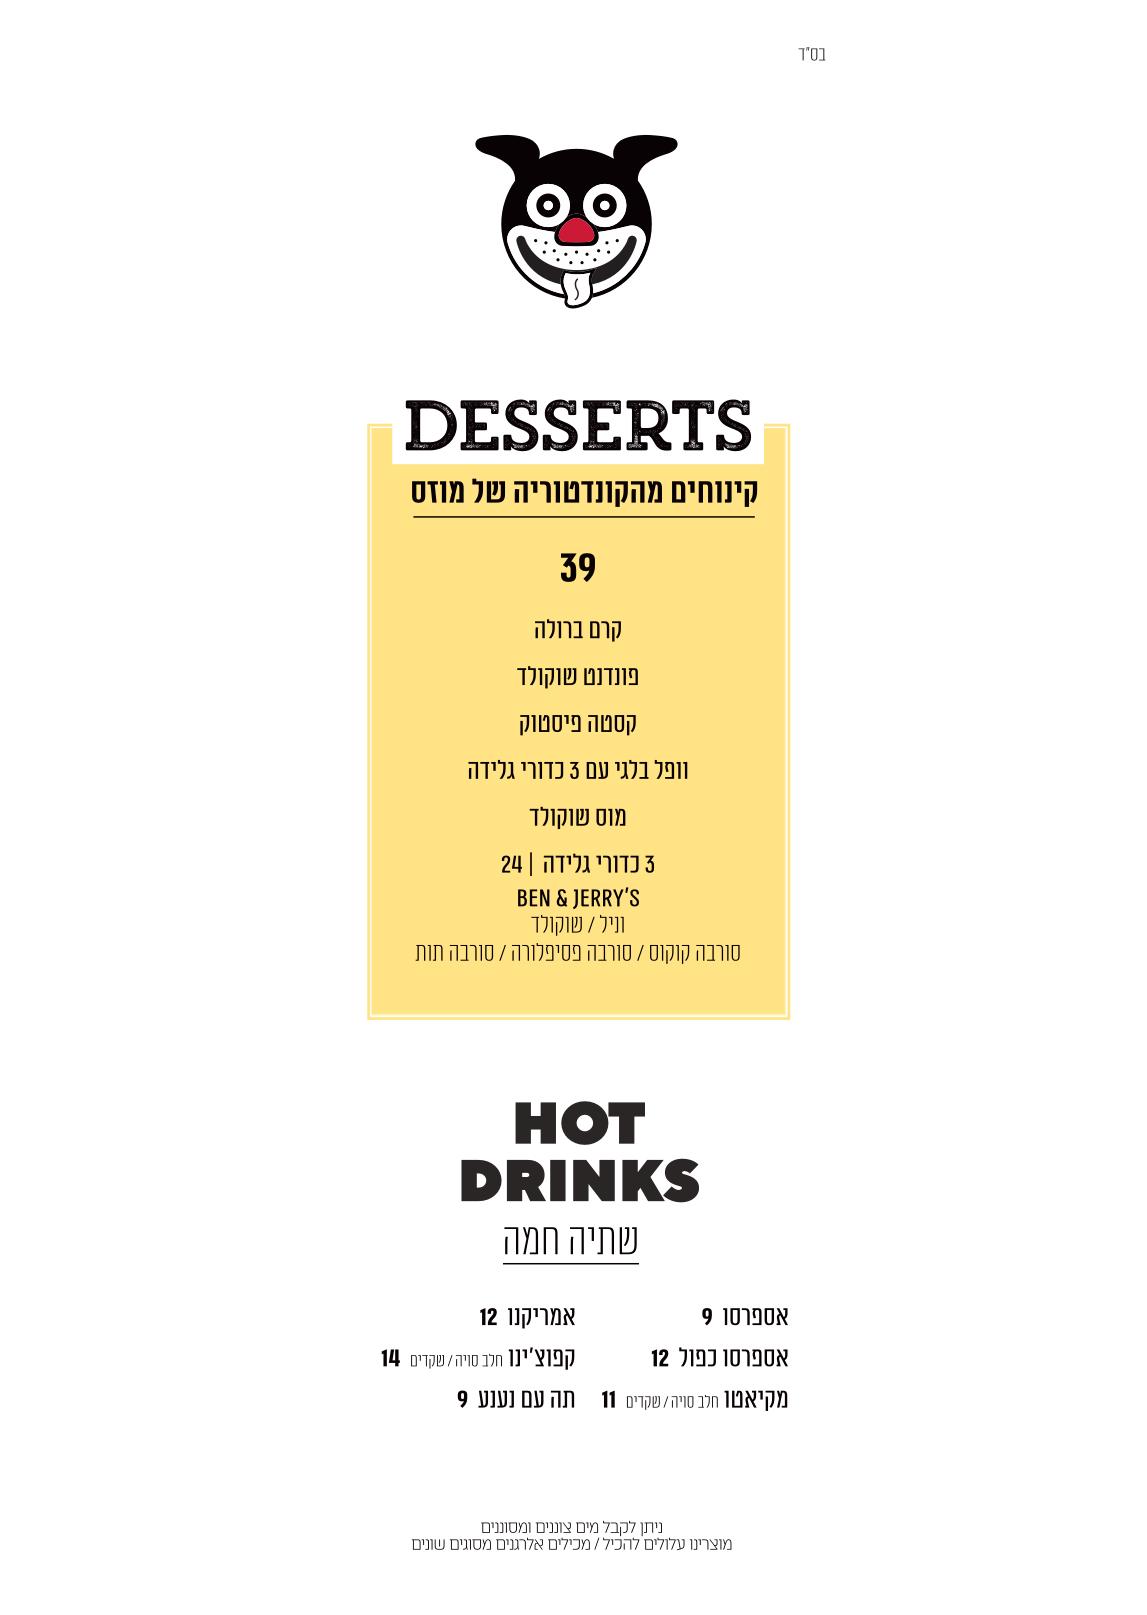 desserts - כשר